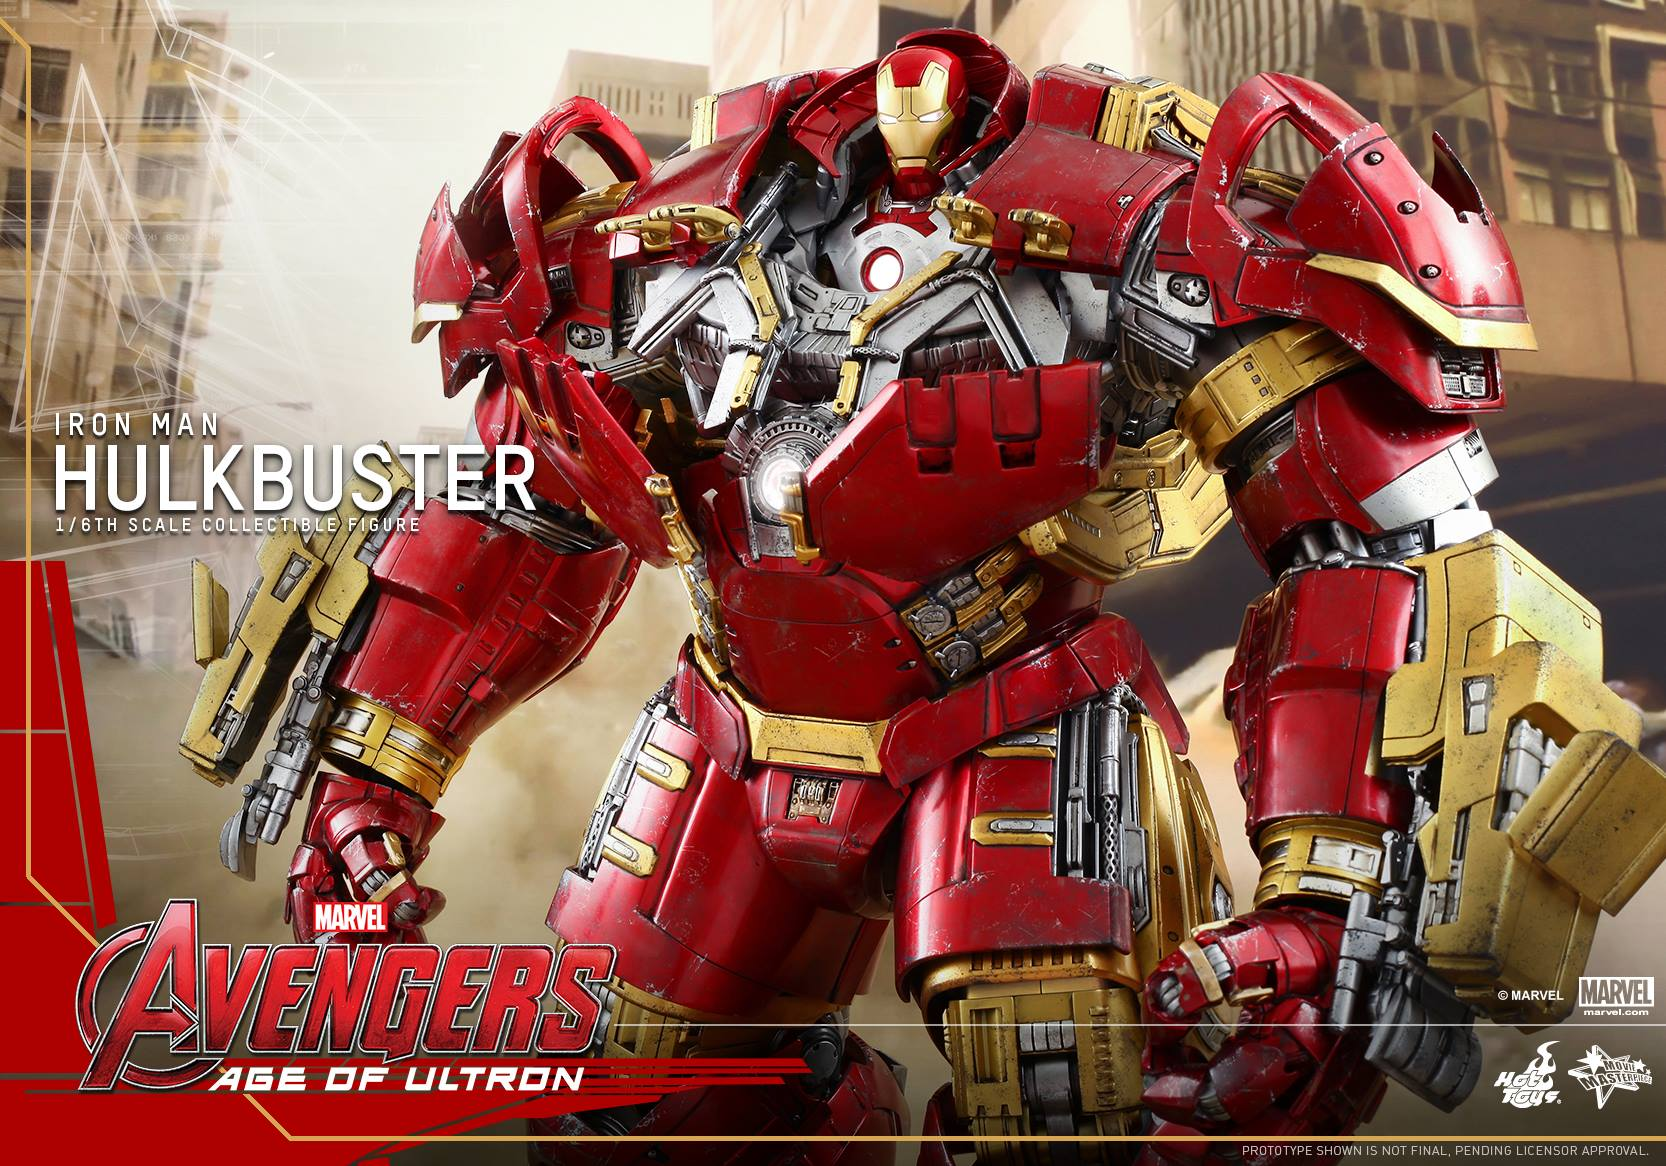 http://i0.wp.com/www.slashfilm.com/wp/wp-content/images/Hot-Toys-Avengers-Hulkbuster-19.jpg?fit=3000%2C3000